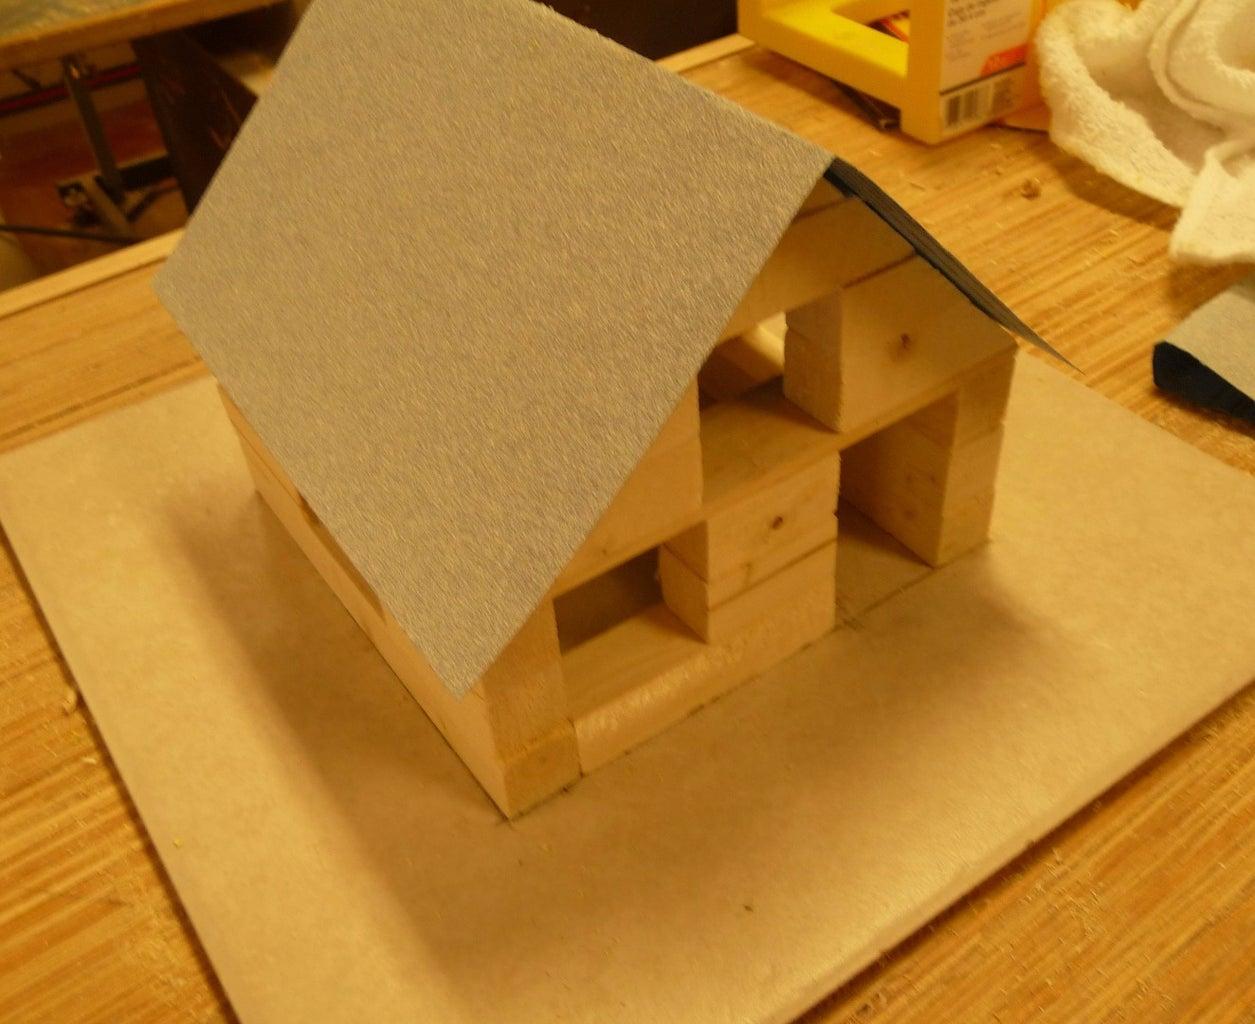 KinderShop Project, a Rustic Cabin